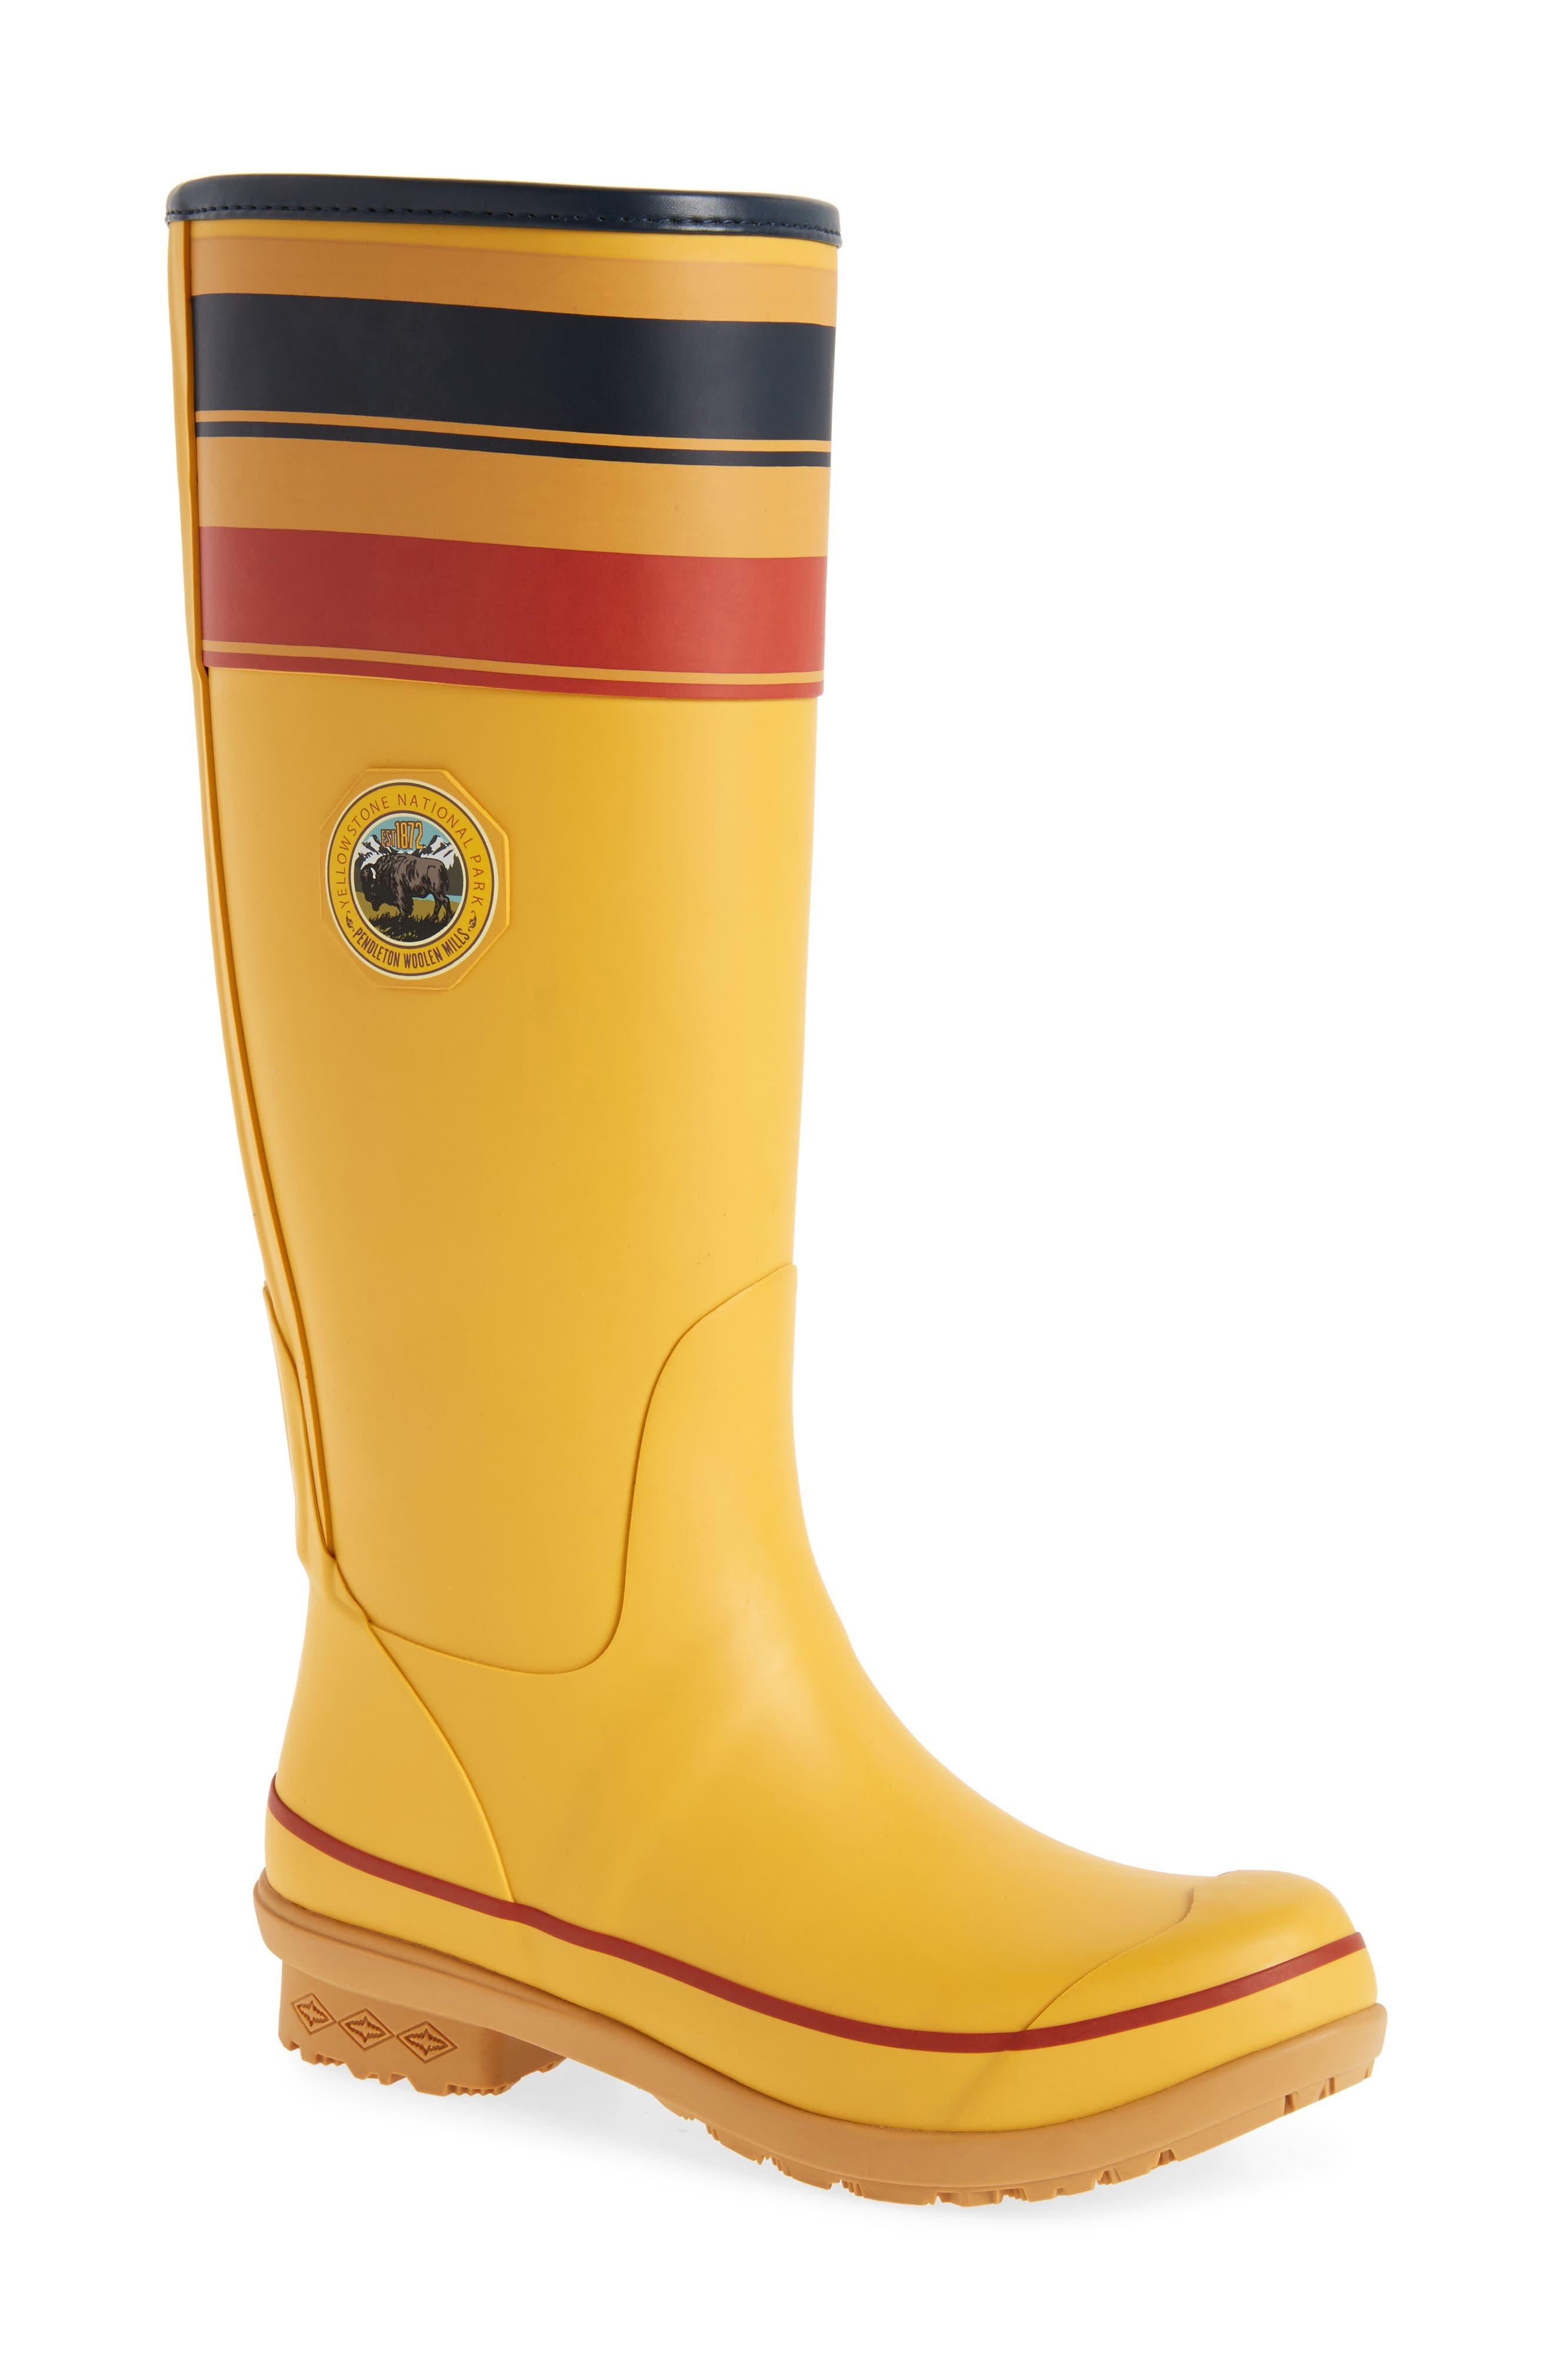 Pendleton Yellowstone National Park Tall Rain Boot,                         Main,                         color, YELLOW